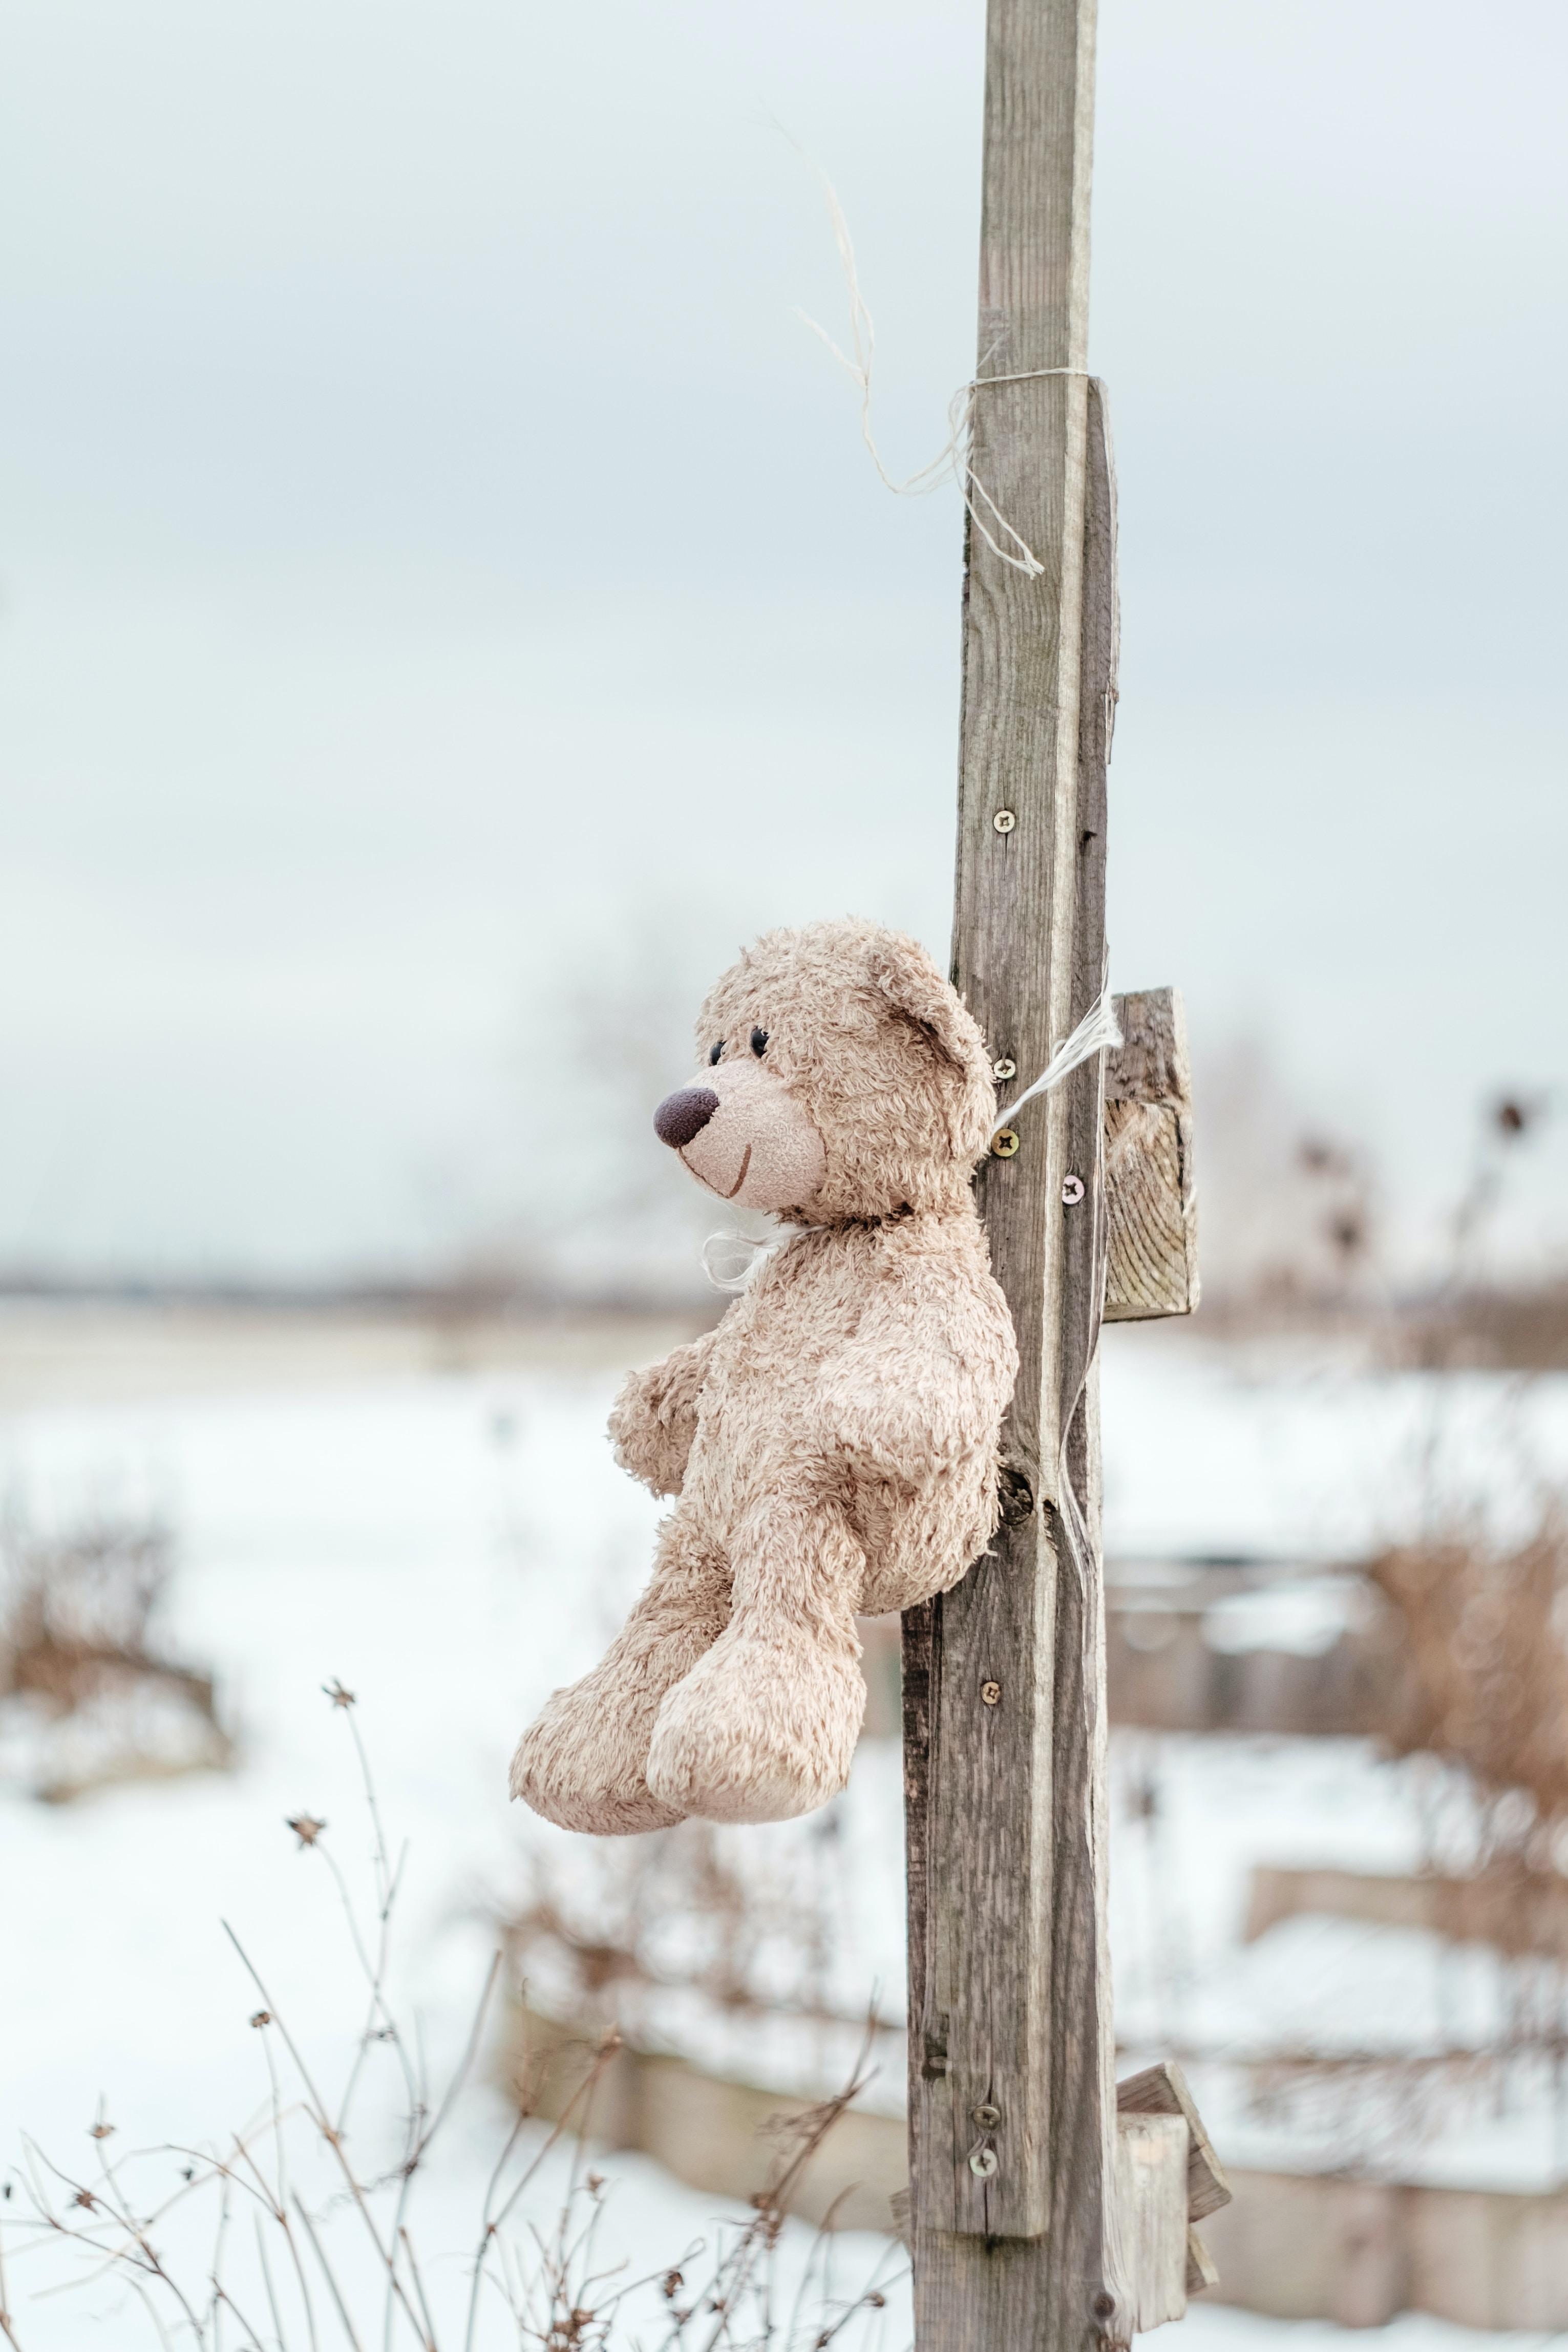 A stuffed bear tied against a wooden pole outside.